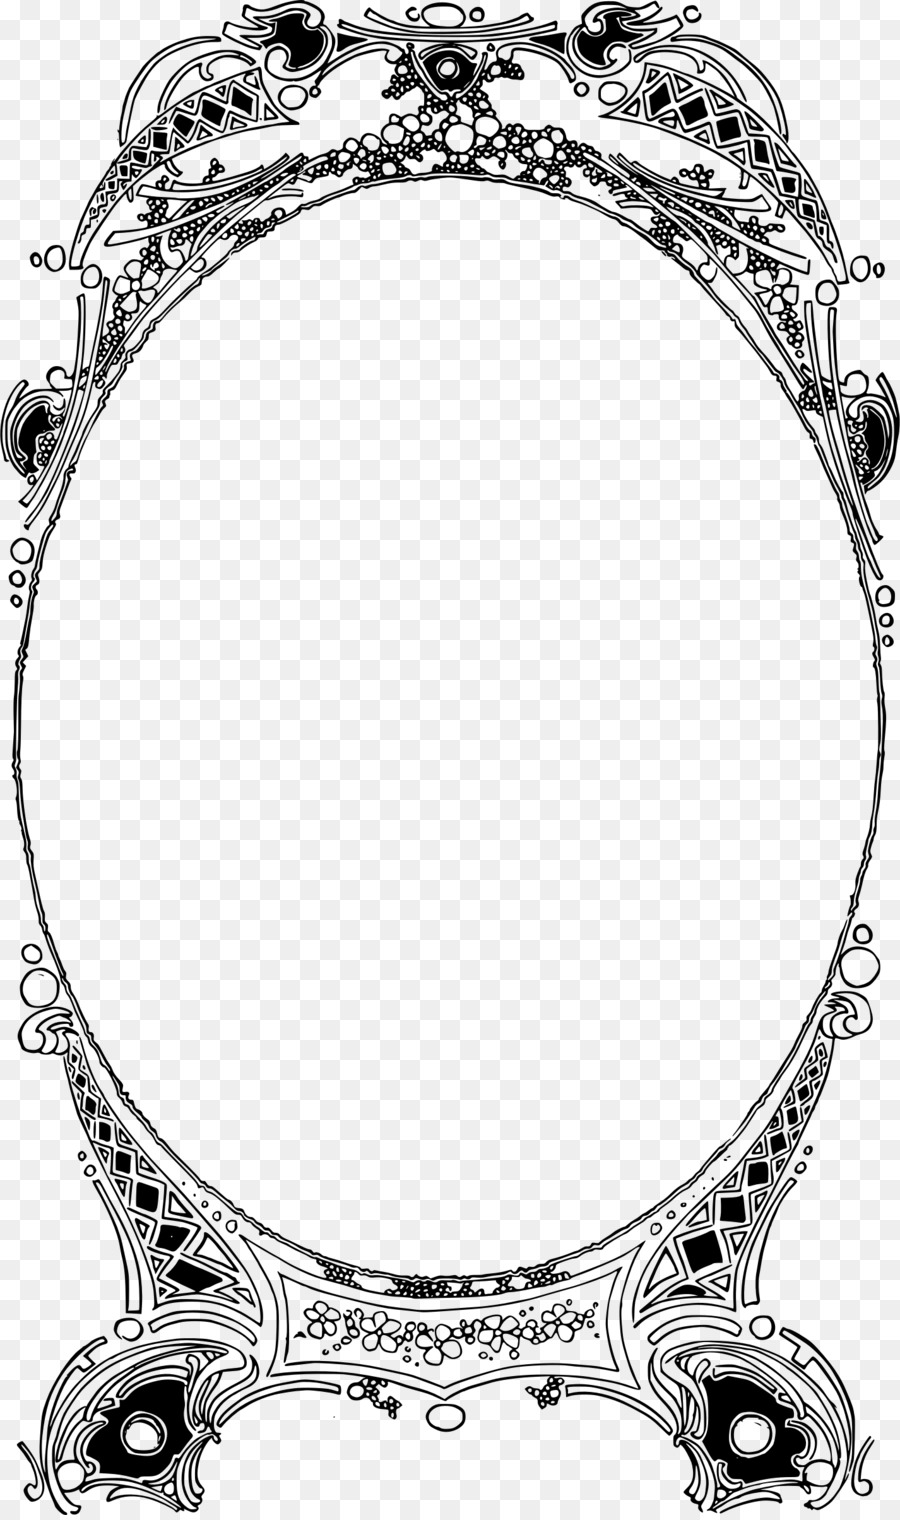 Picture Frames Clip art - circle frame png download - 1426*2400 ...